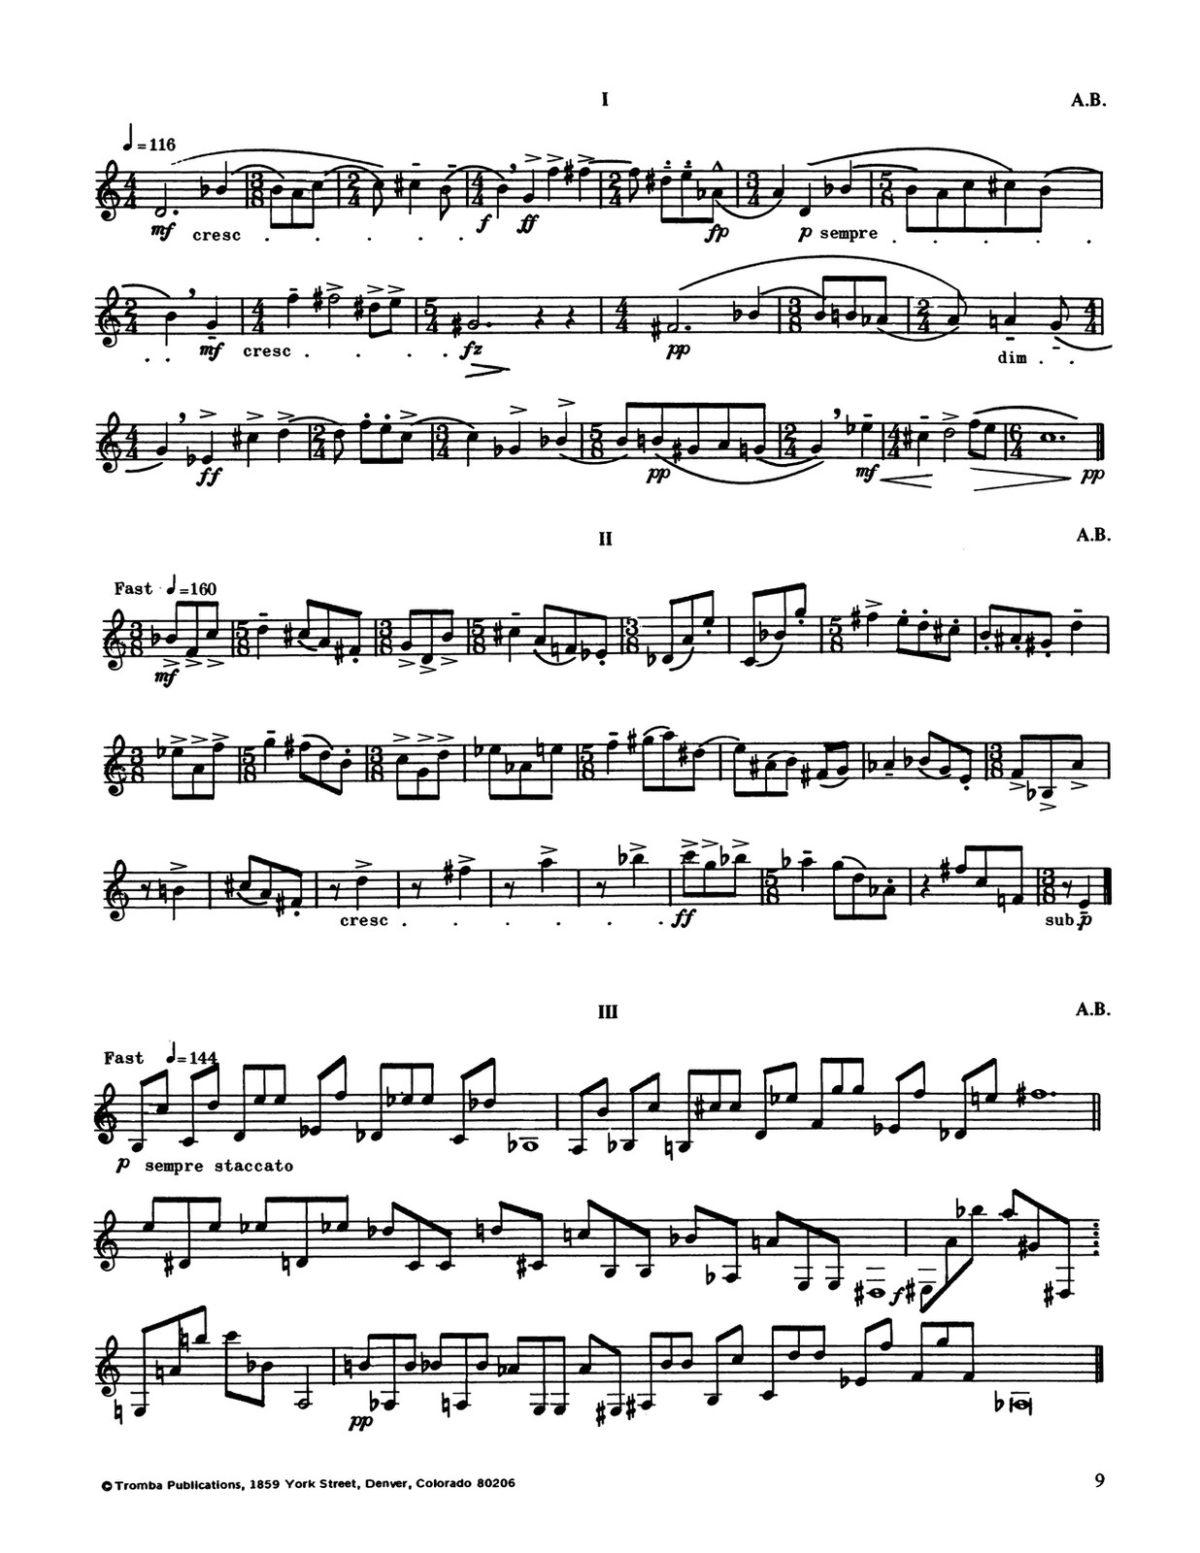 Blatter, Zonn, ann. Hickman Contemporary Trumpet Studies-p13